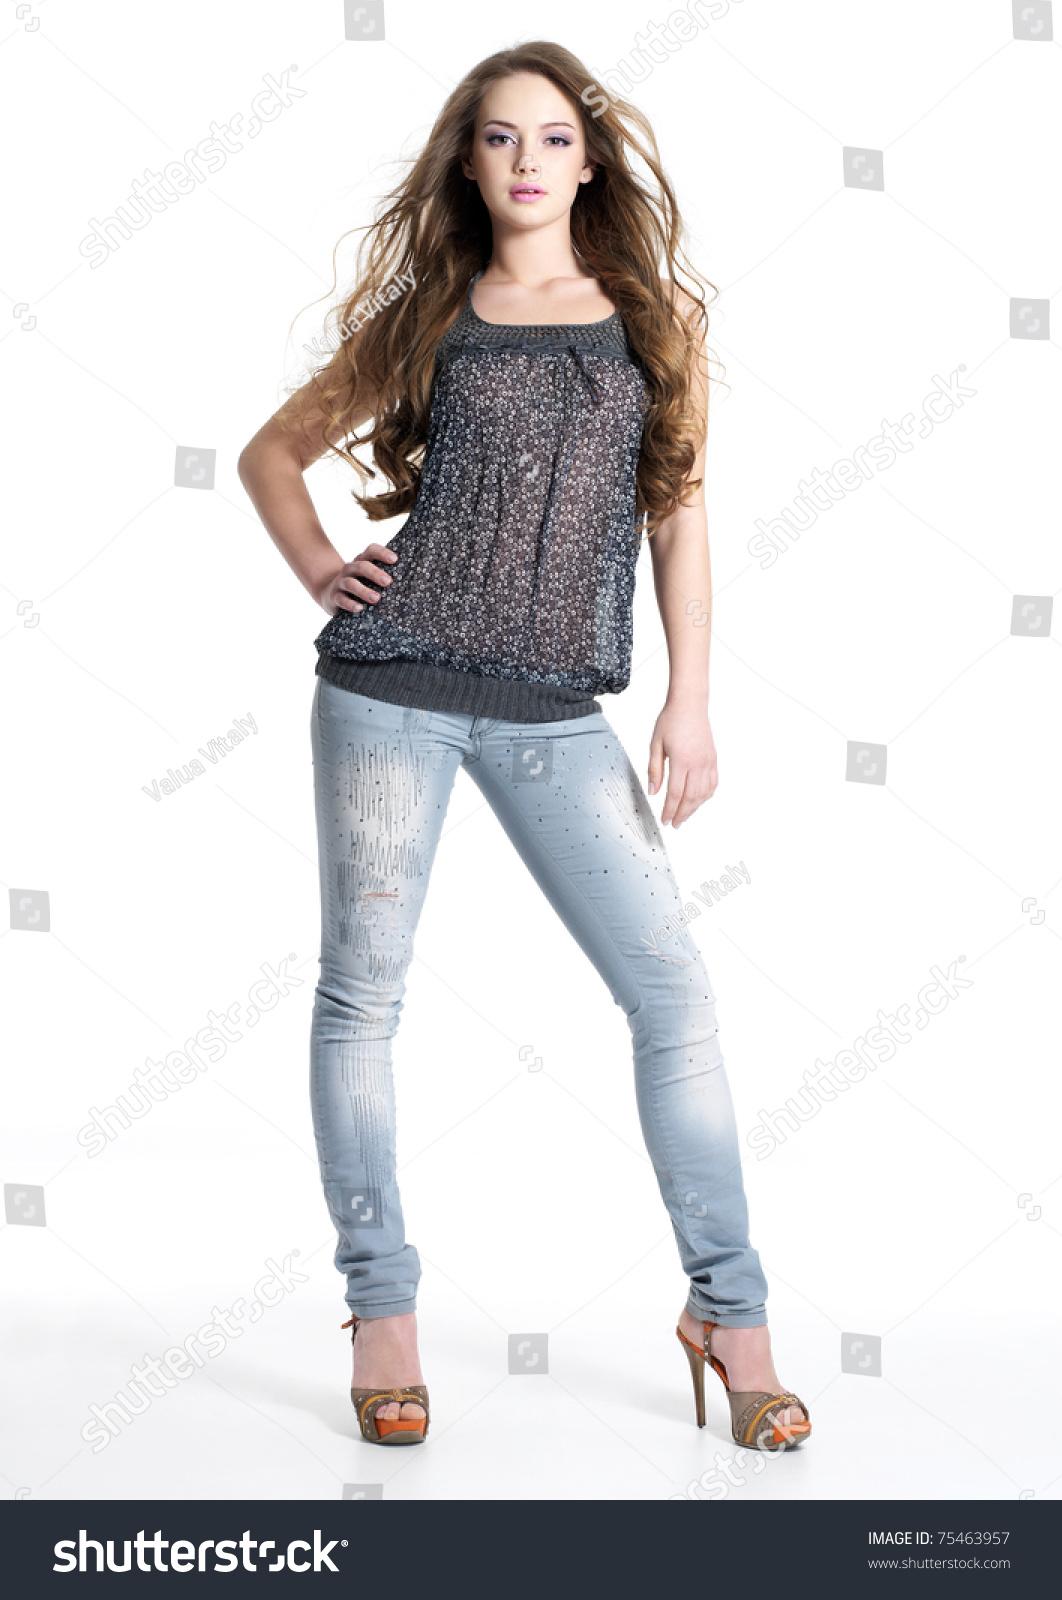 3d25be8238b Full portrait of beautiful stylish girl in fashion stylish jeans posing -  isolated on white background. Fashion model posing at studio.